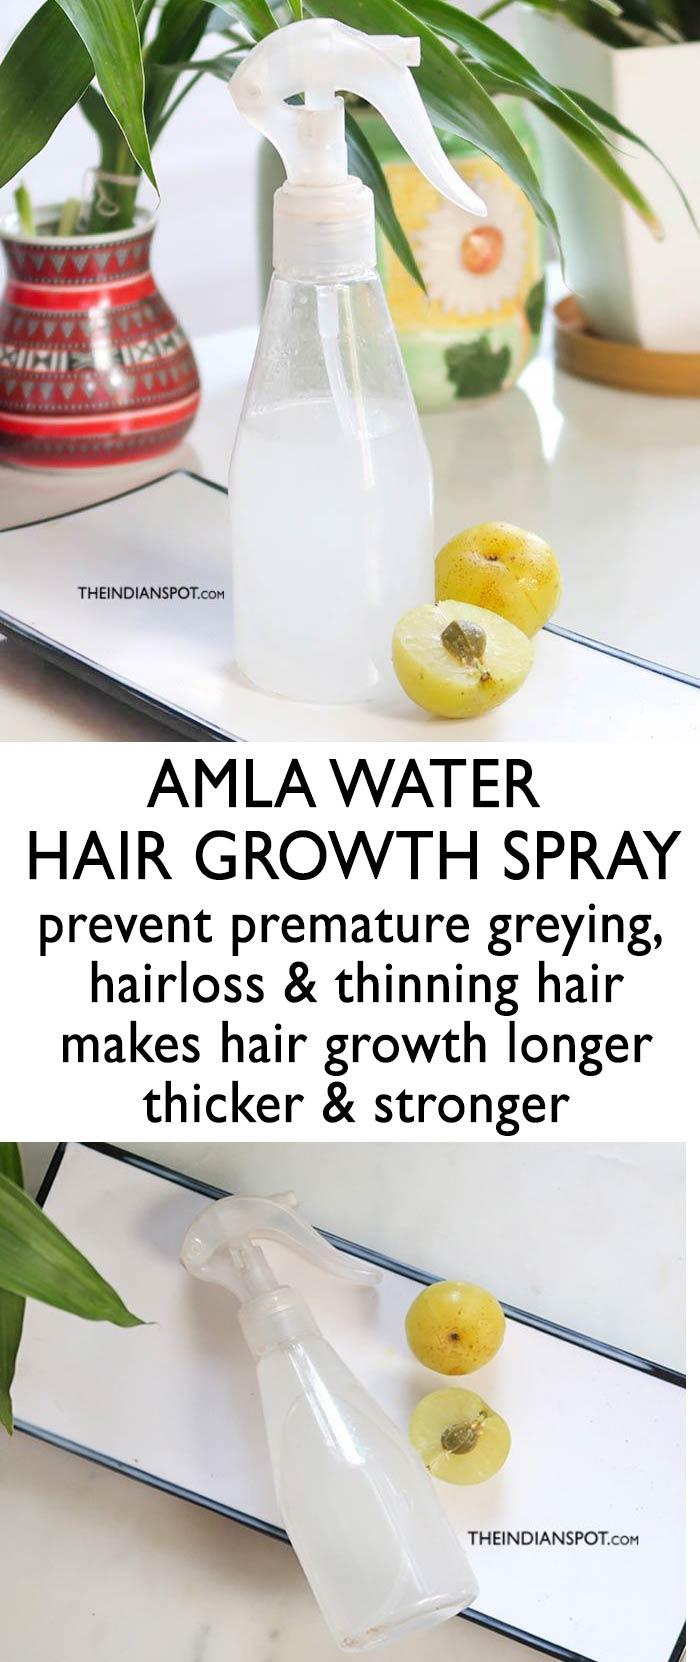 AMLA WATER HAIR GROWTH SPRAY